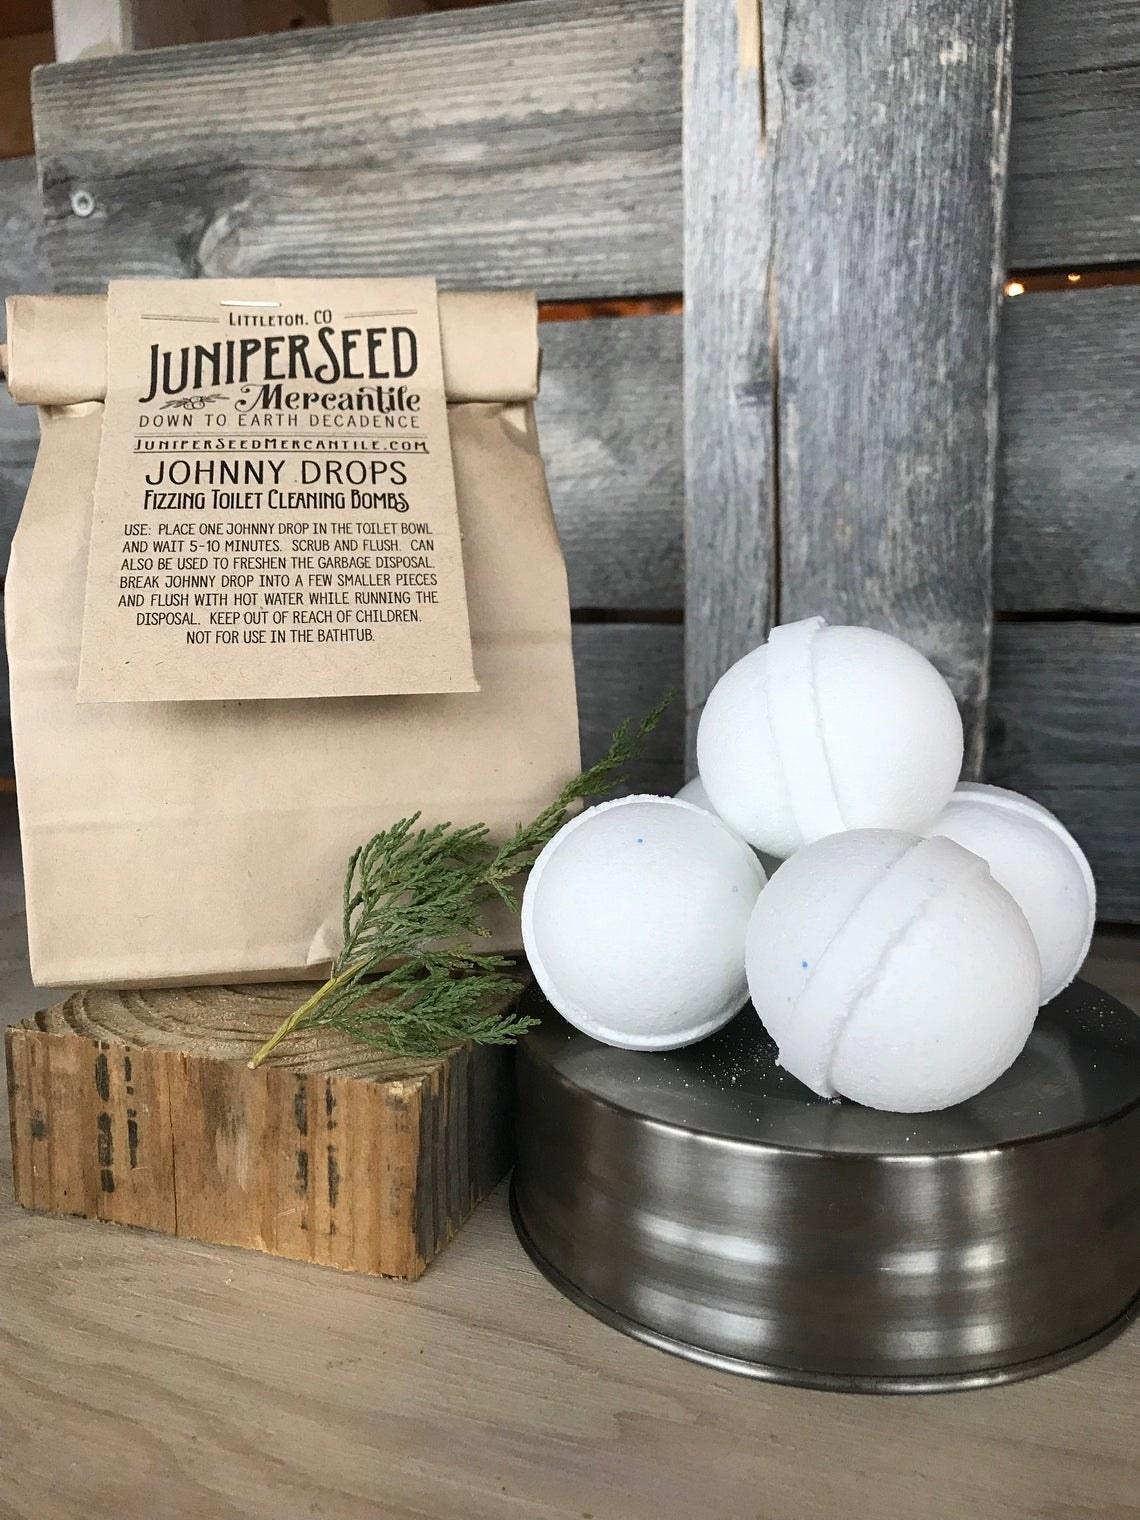 the white toilet bombs shaped like balls beside the bag